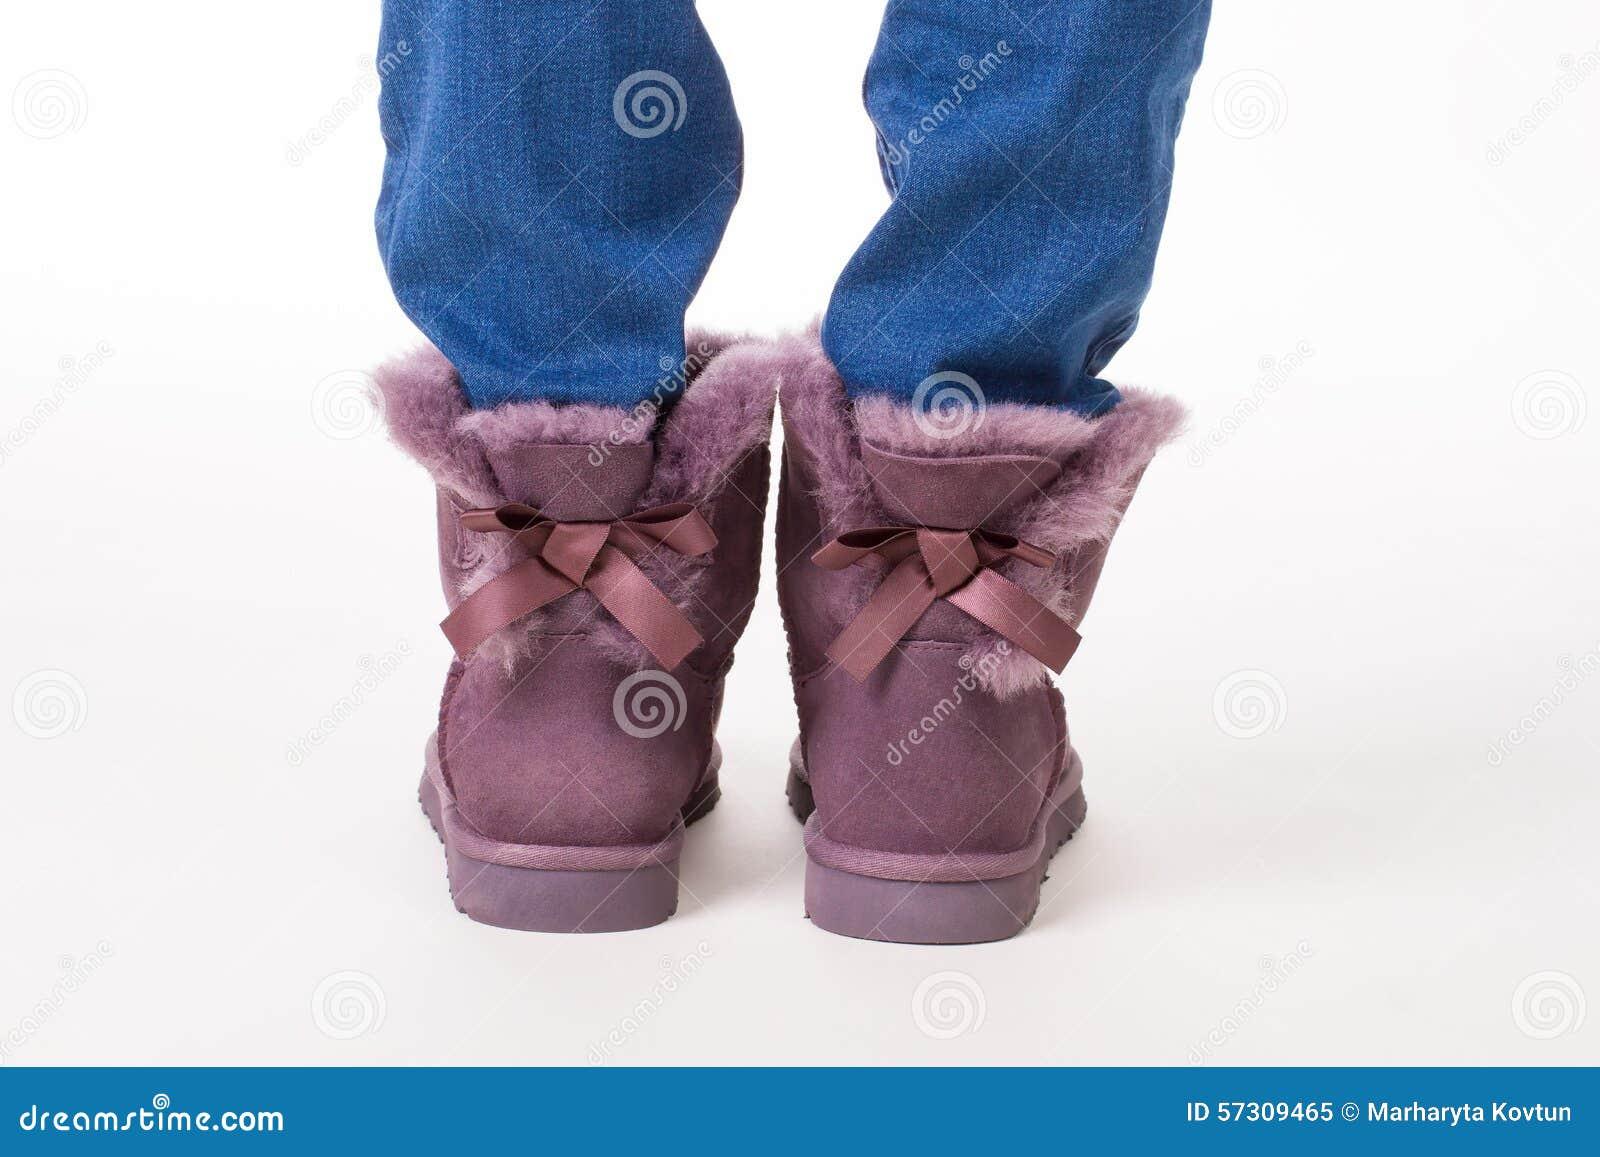 online store c1e07 afa0c Scarpe Australiane Femminili Immagine Stock - Immagine di ...